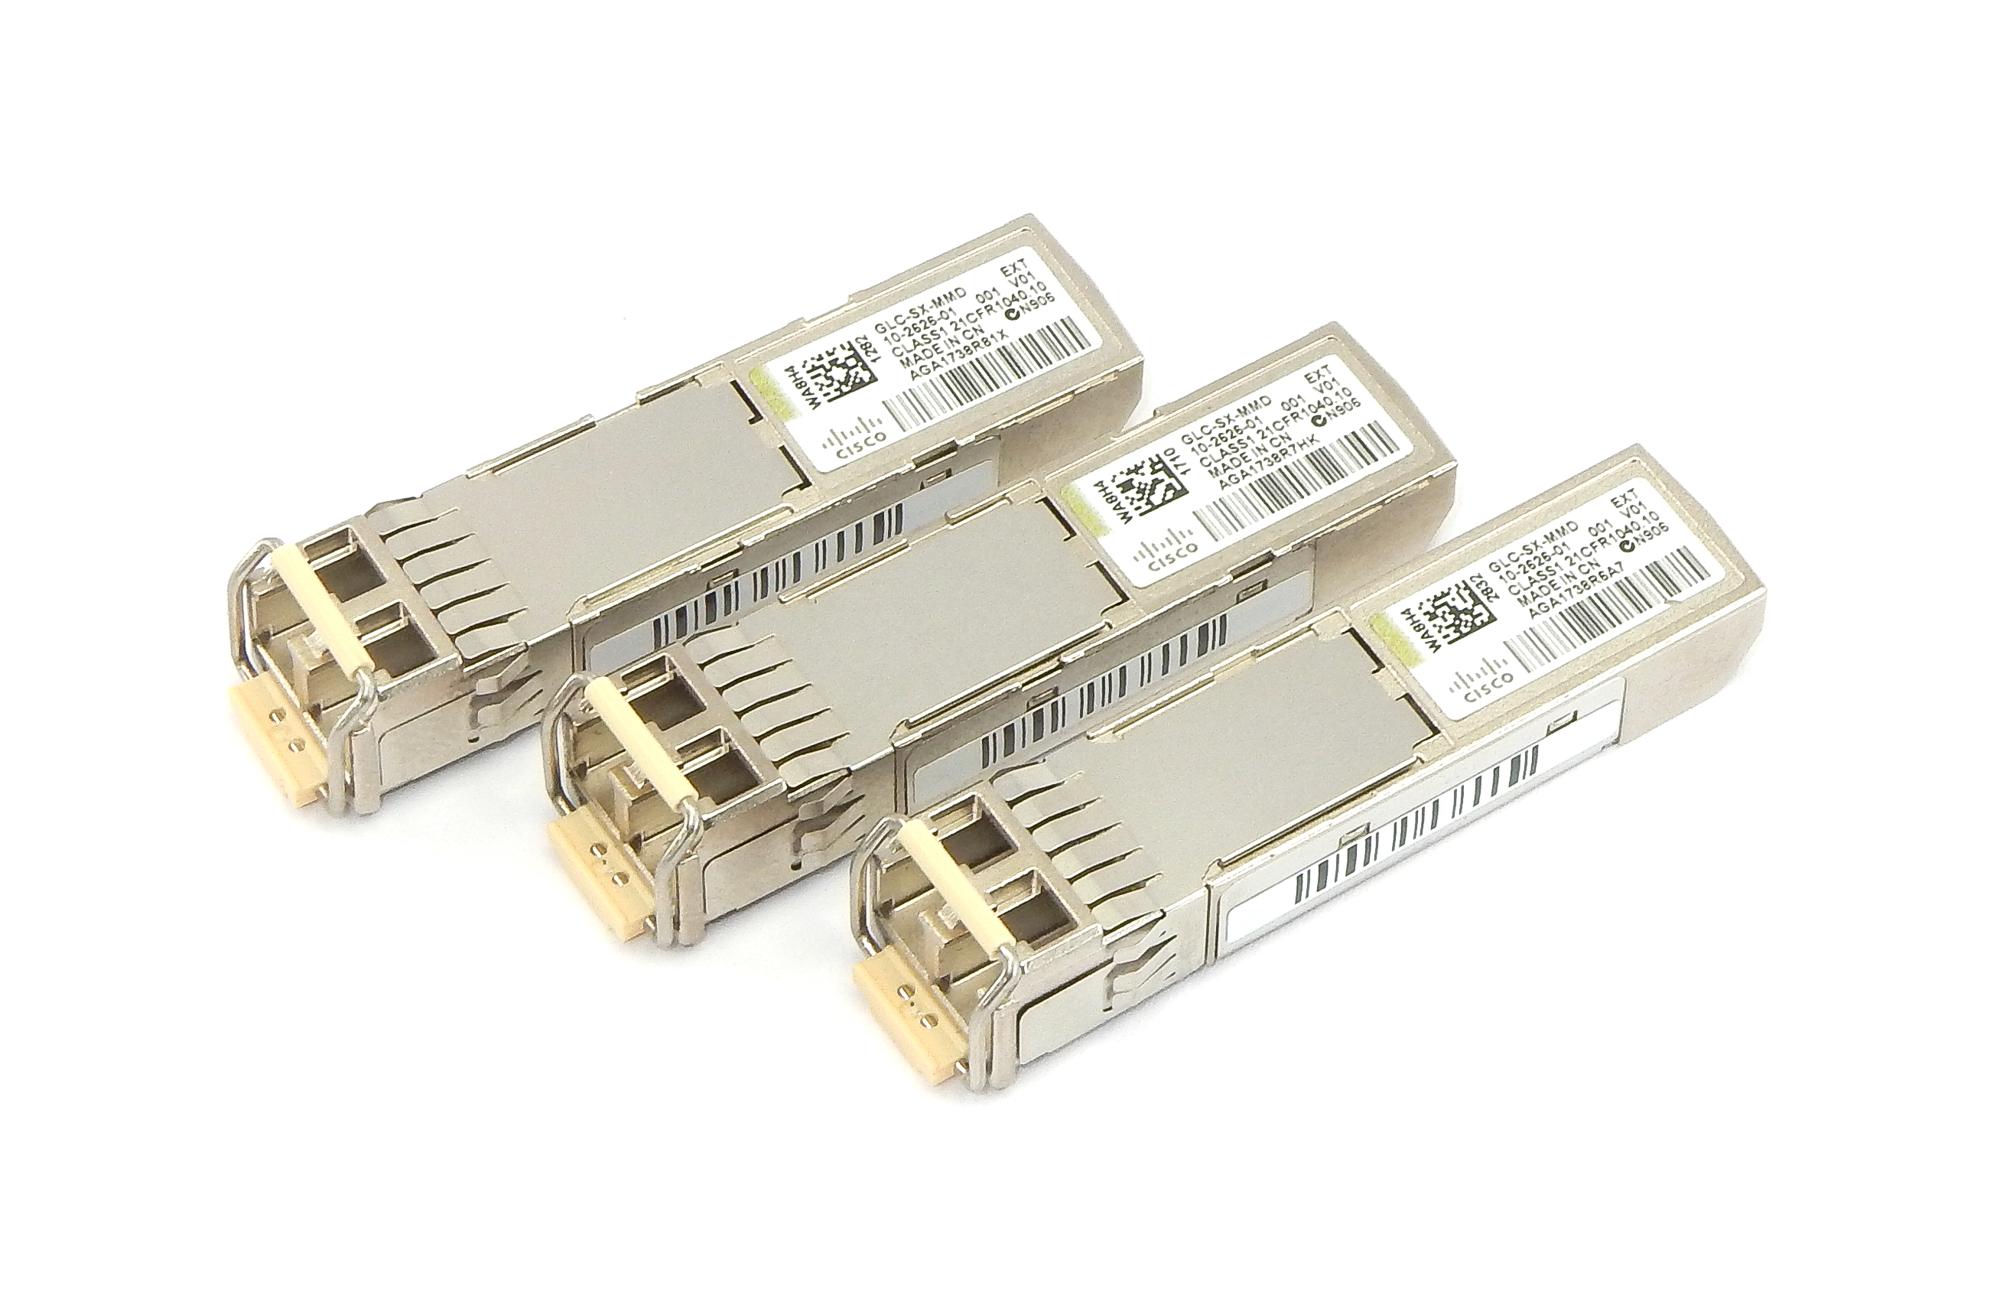 3x Cisco 10-2626-01 SFP GLC-SX-MMD SFP 1000BASE-SX Transceiver Modules